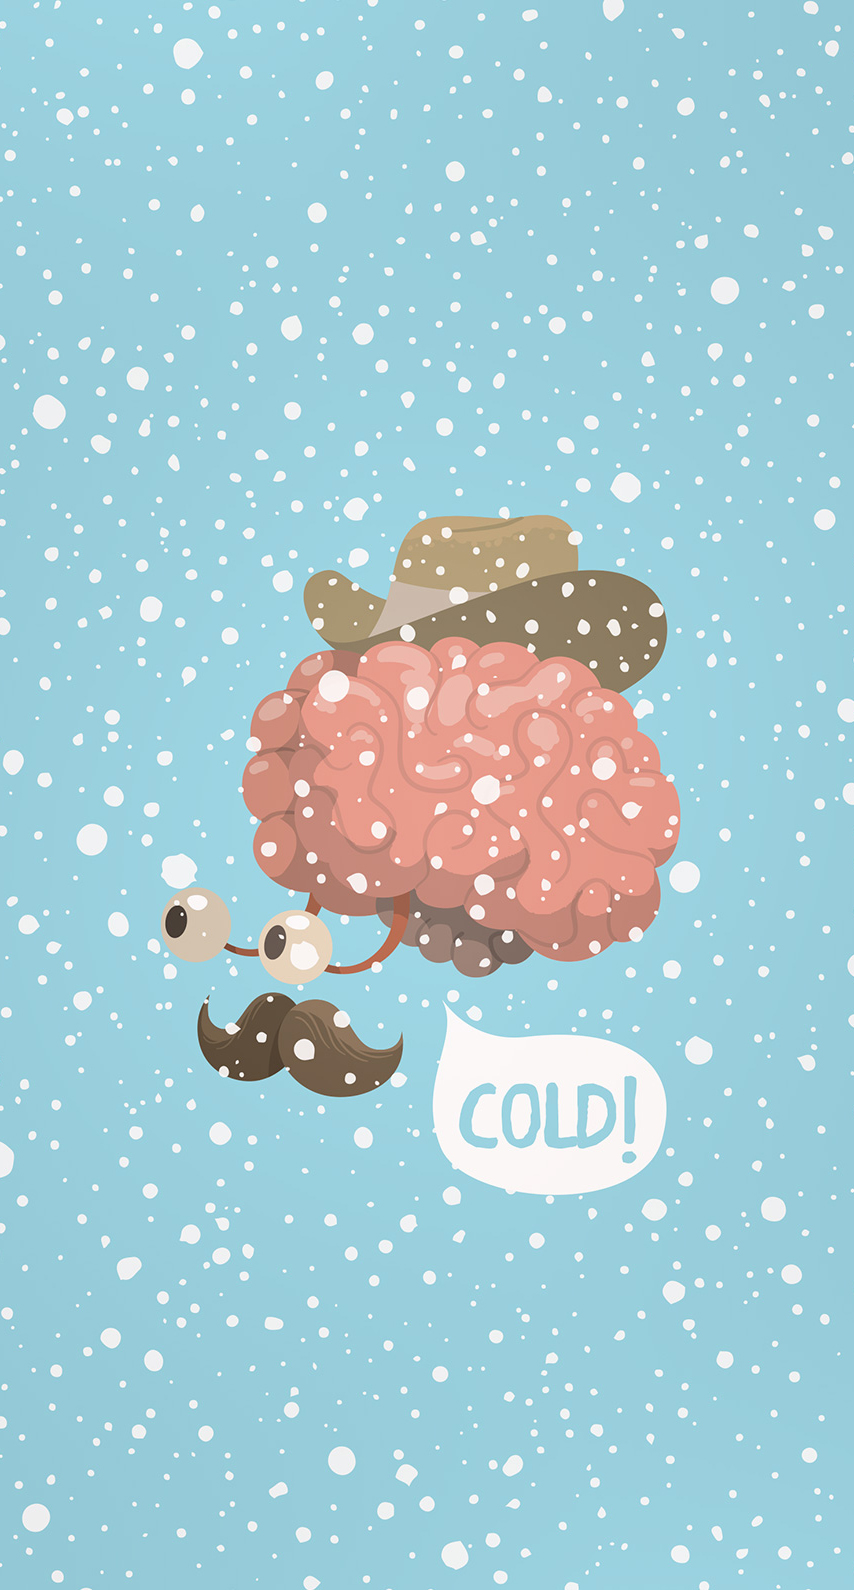 snowflake, brain